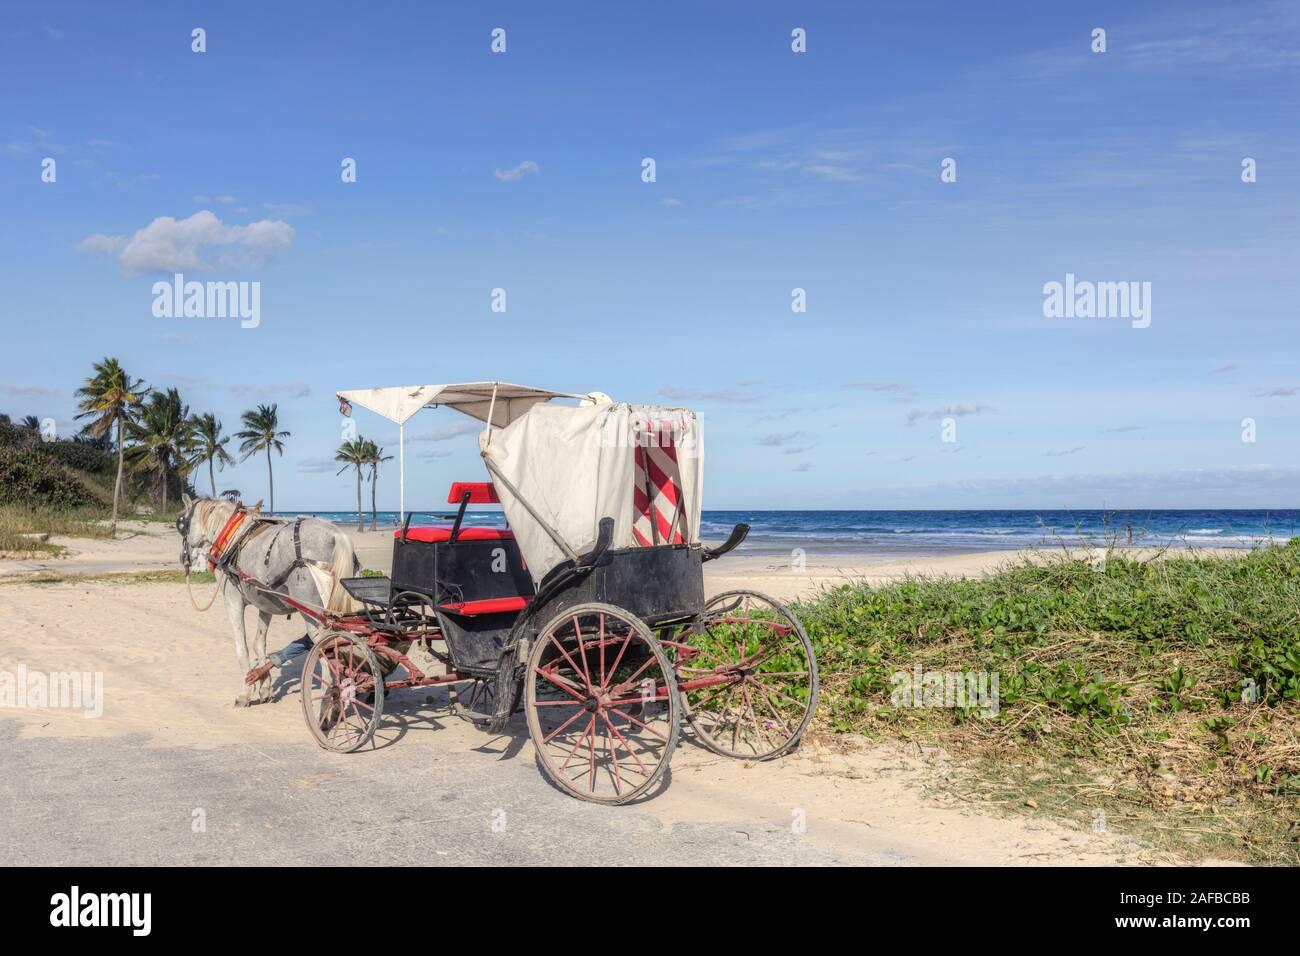 Playa Boca Ciega, Playas del Este, La Havane, Cuba, Amérique du Nord Banque D'Images